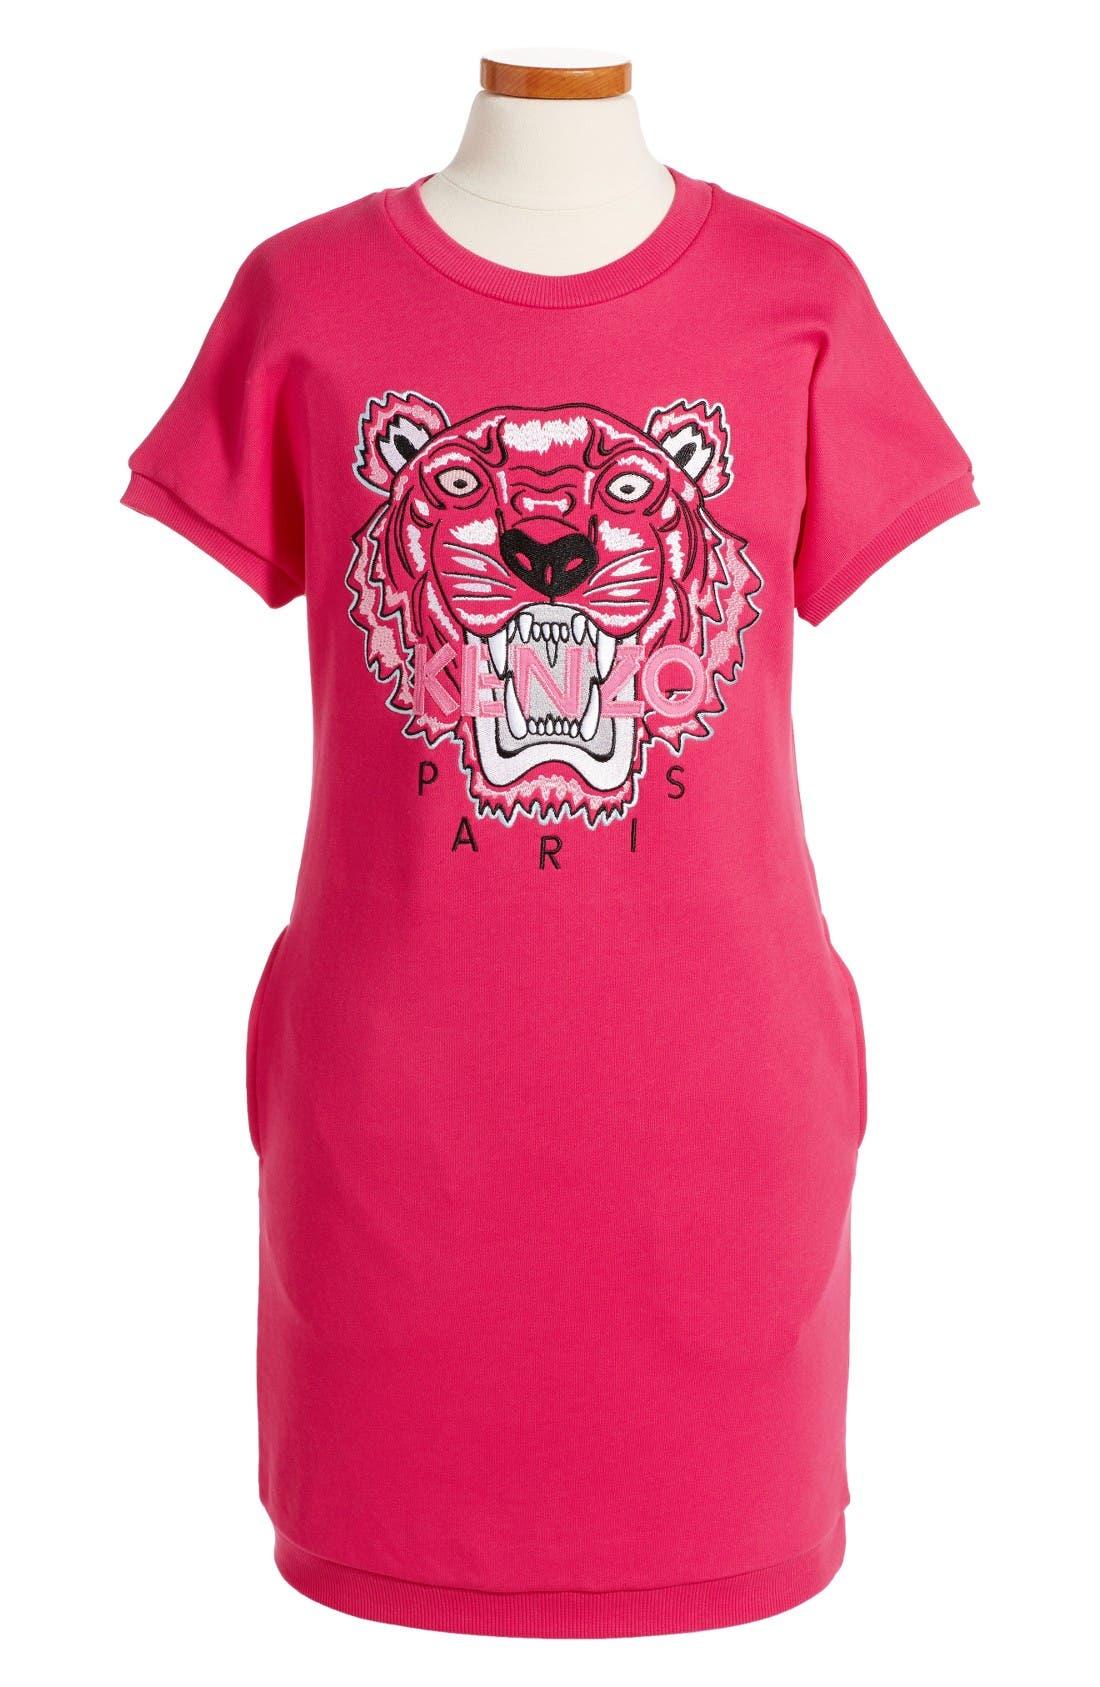 Main Image - KENZO Embroidered Tiger Sweatshirt Dress (Toddler Girls, Little Girls & Big Girls)